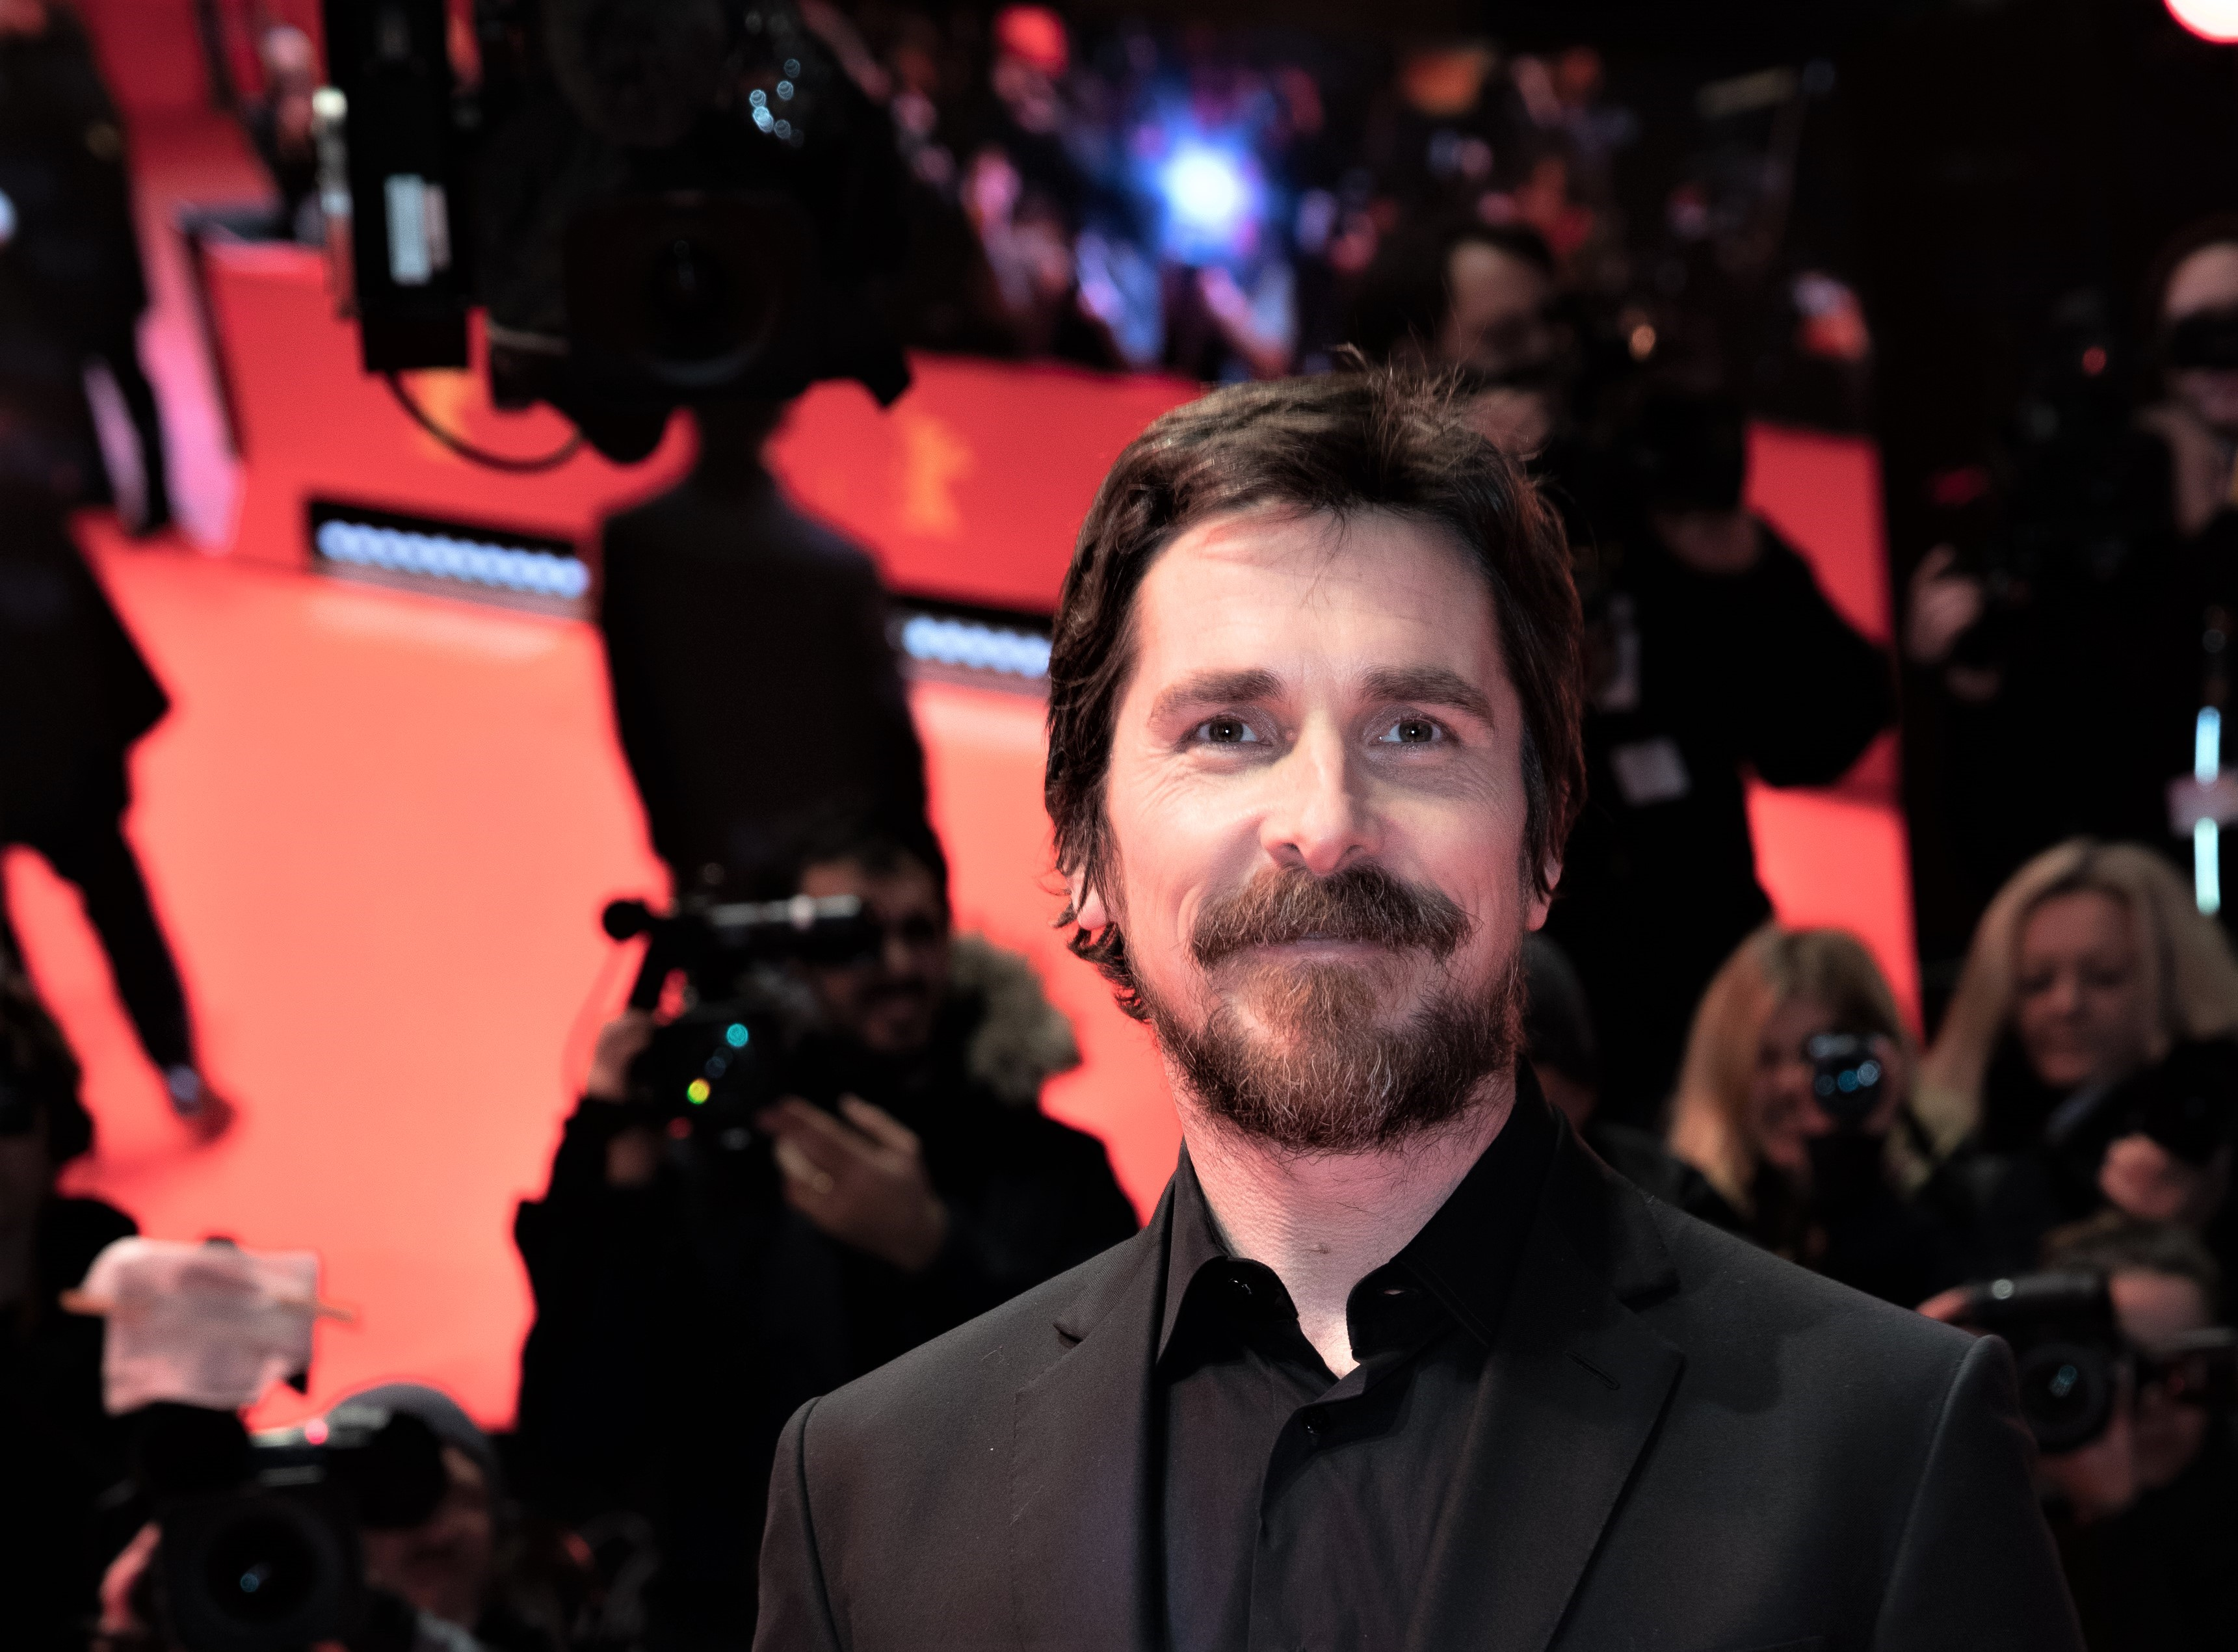 Christian Bale photo #111406, Christian Bale image